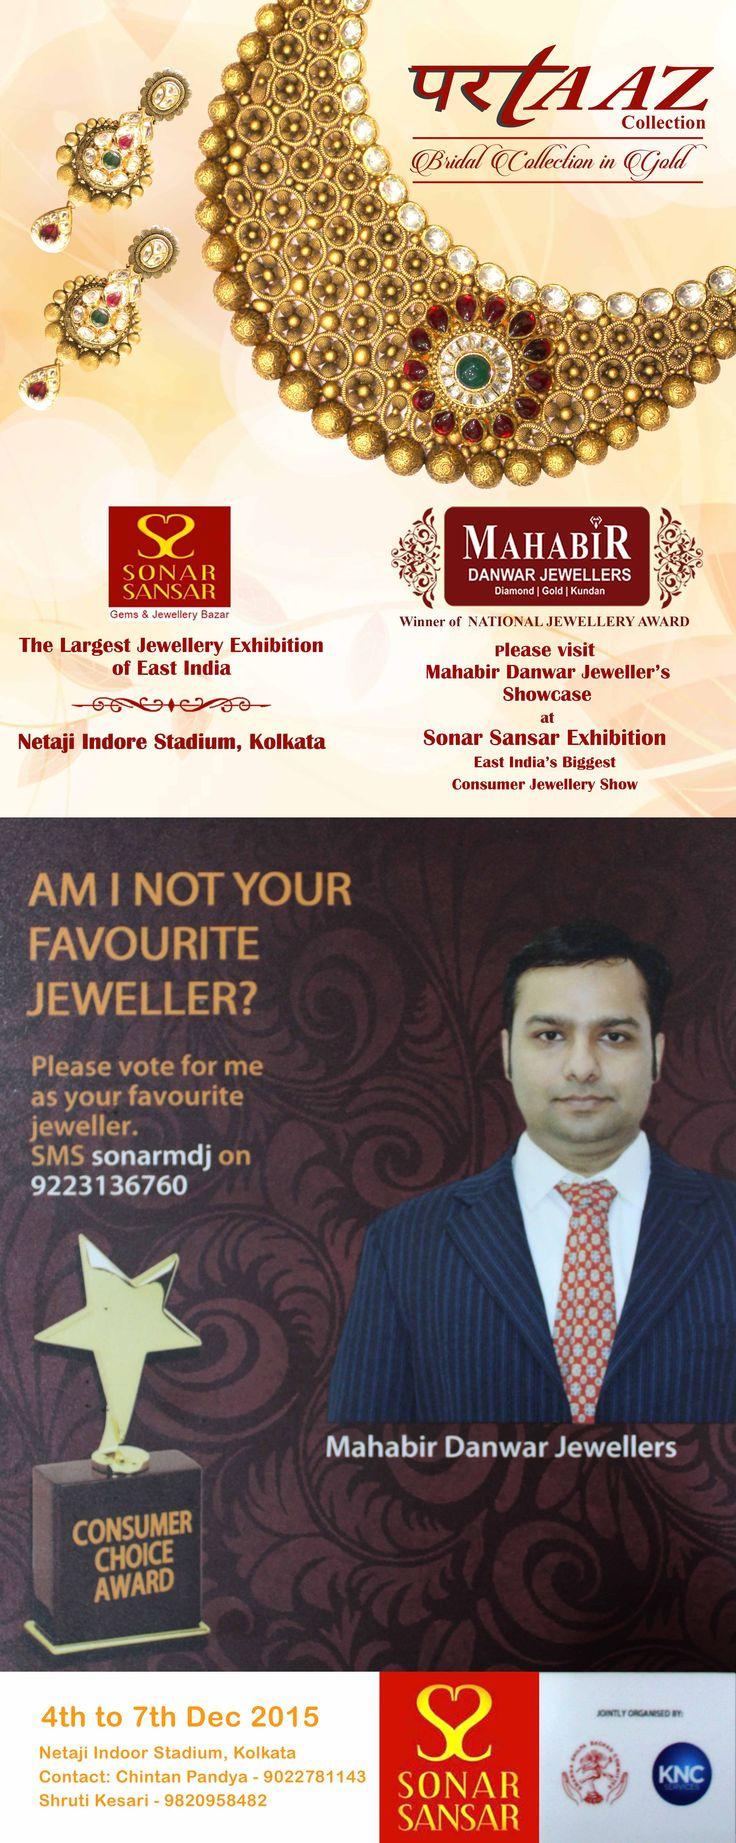 Visit to Experience PARTAAZ Collection by MAHABIR DANWAR JEWELLERS @ SONAR SANSAR, Exihibition 4-7 Dec.2015 Netaji Indore Stadium, Kolkata